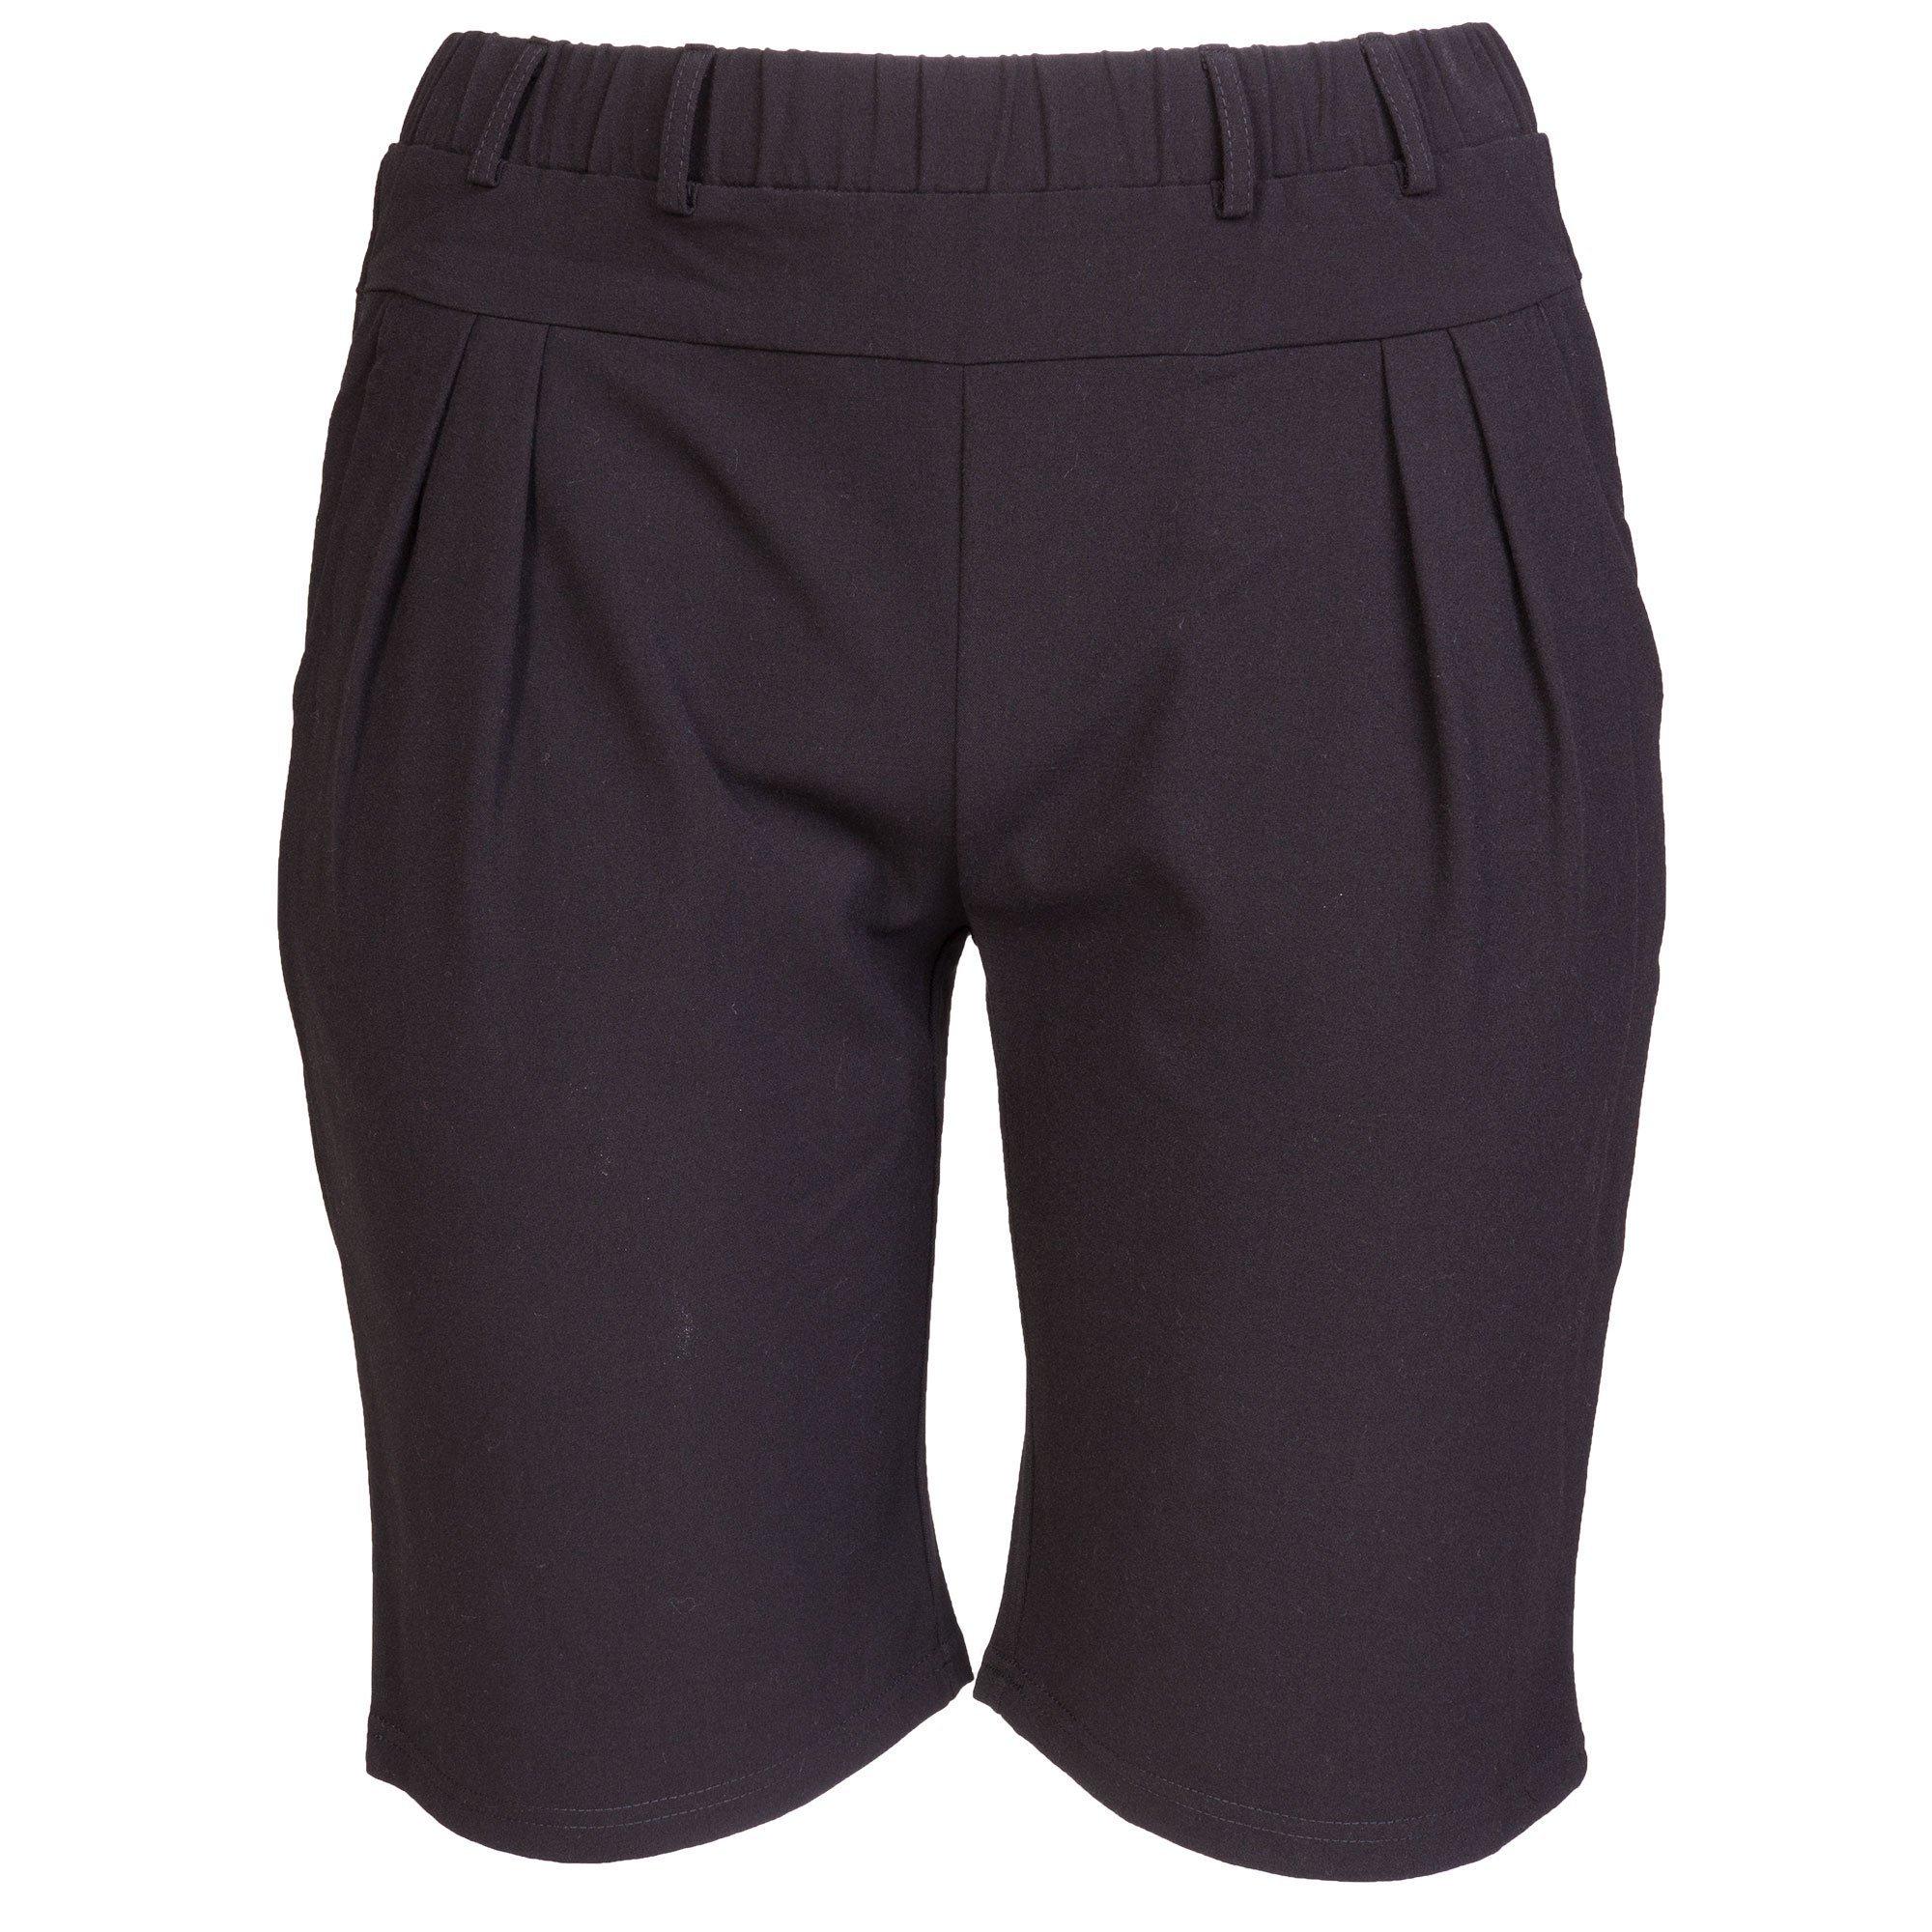 Klassiske sorte shorts med rummelig facon